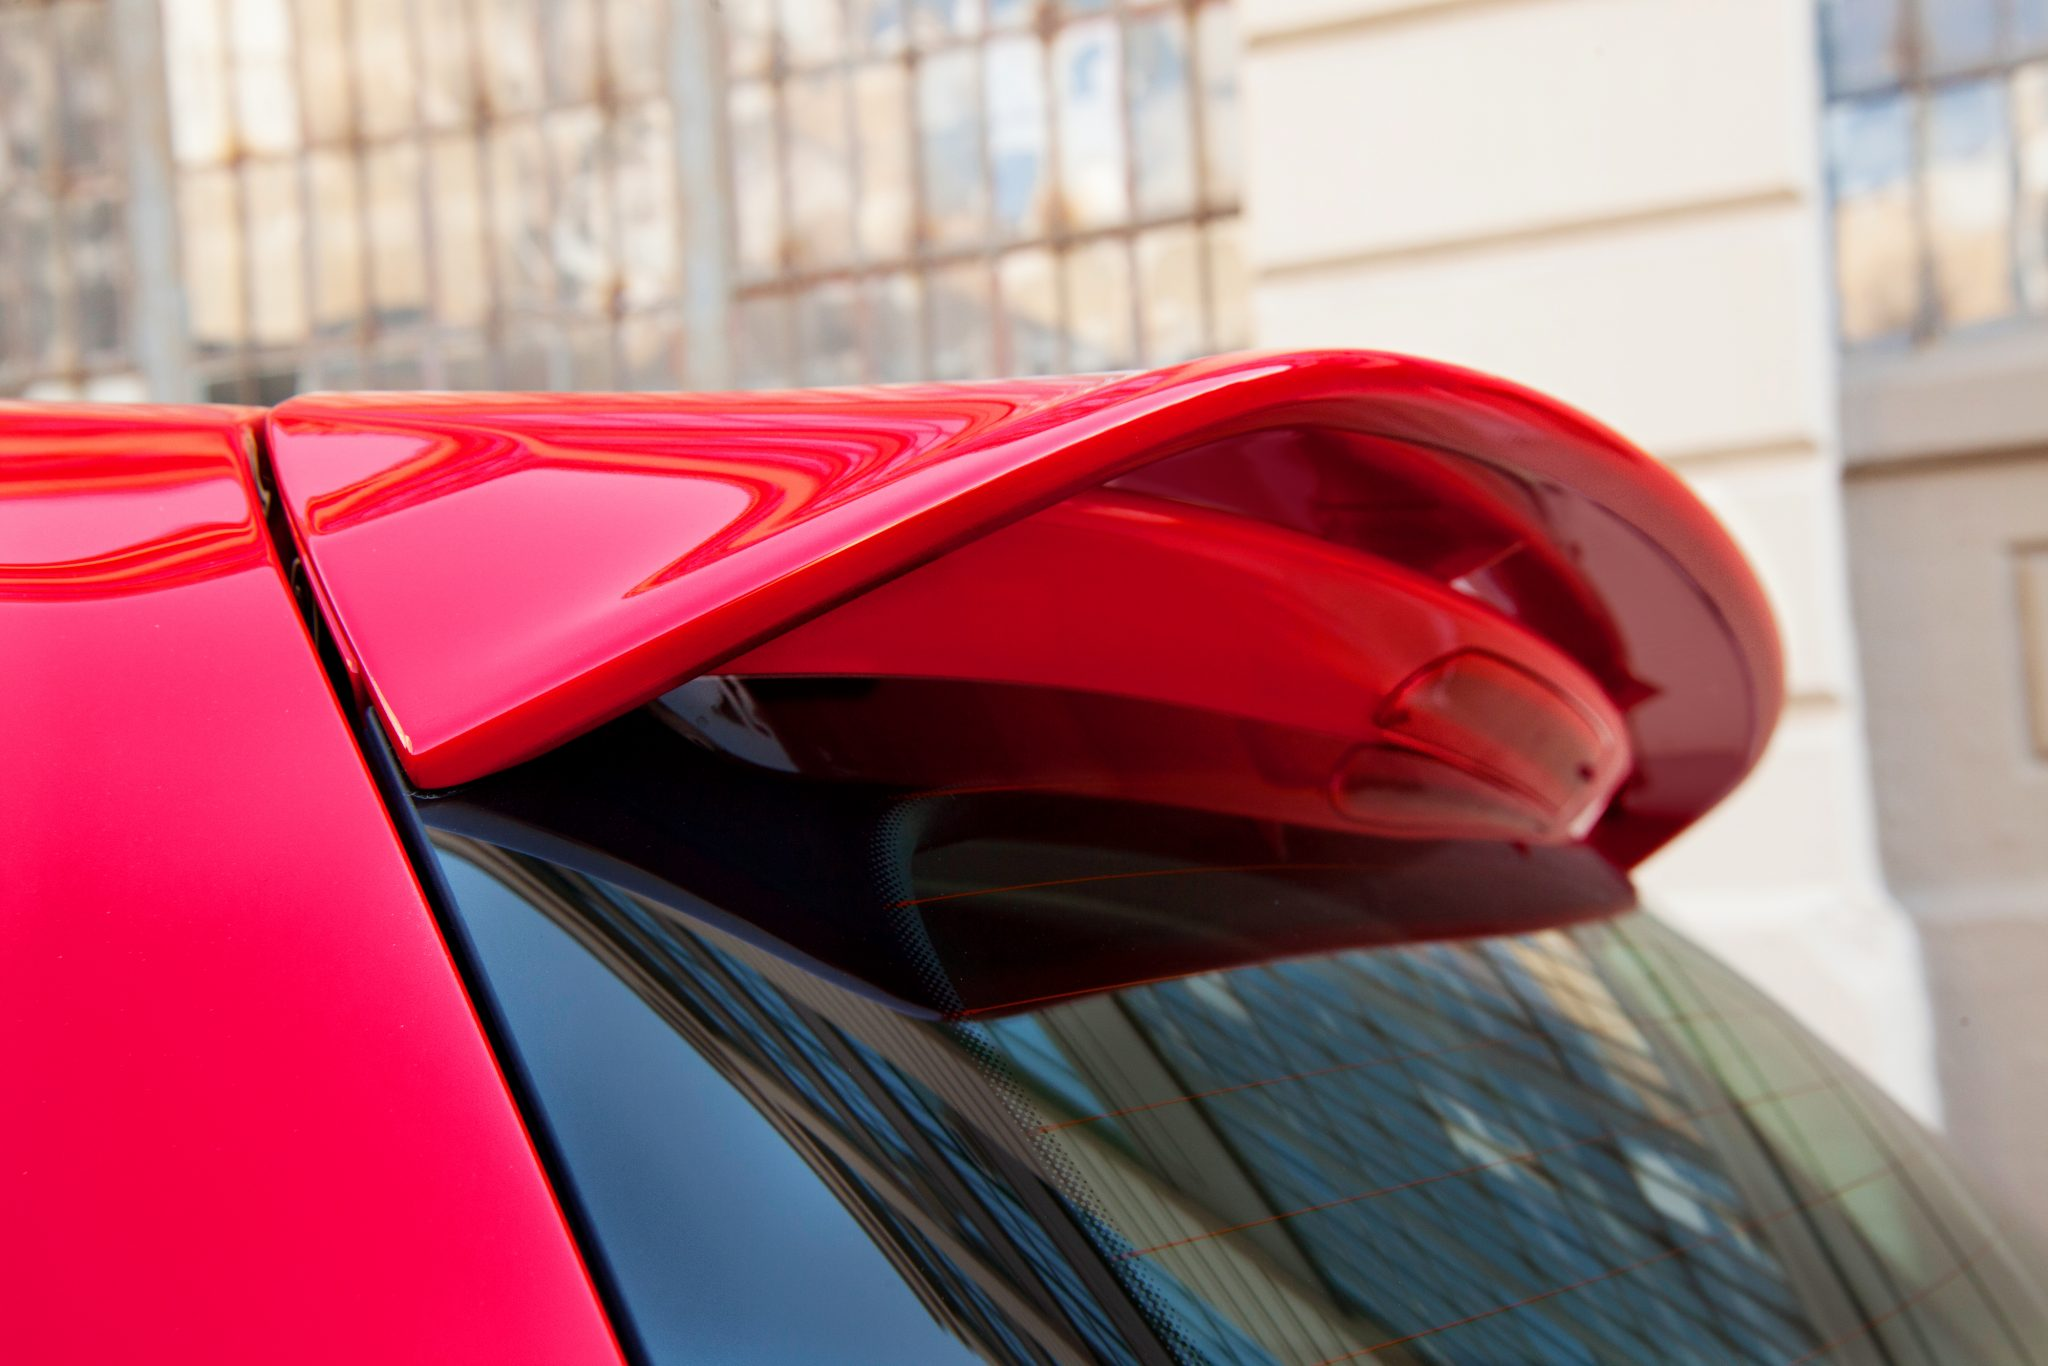 PHOTOS] VW Previews 2015 Volkswagen Golf The News Wheel